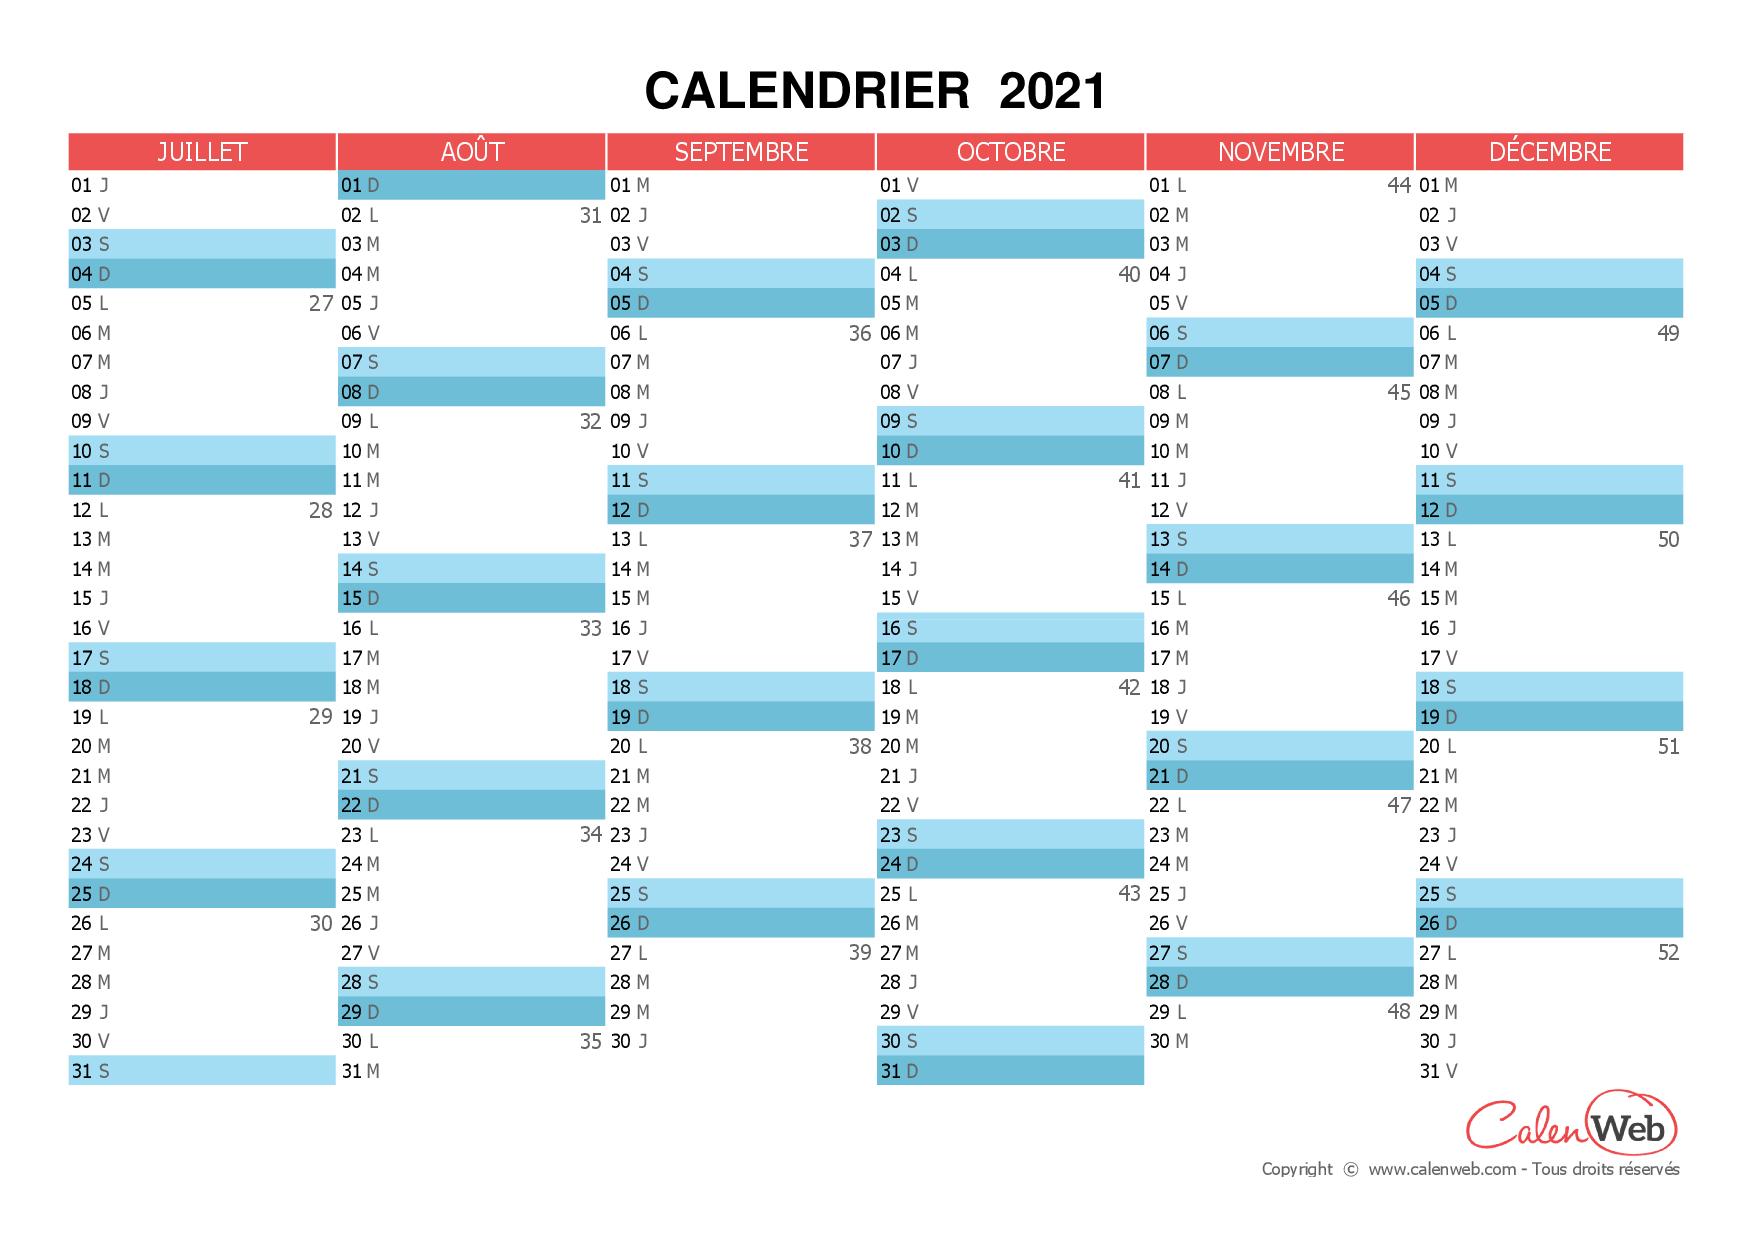 Calendrier semestriel - Année 2021 Planning semestriel ...